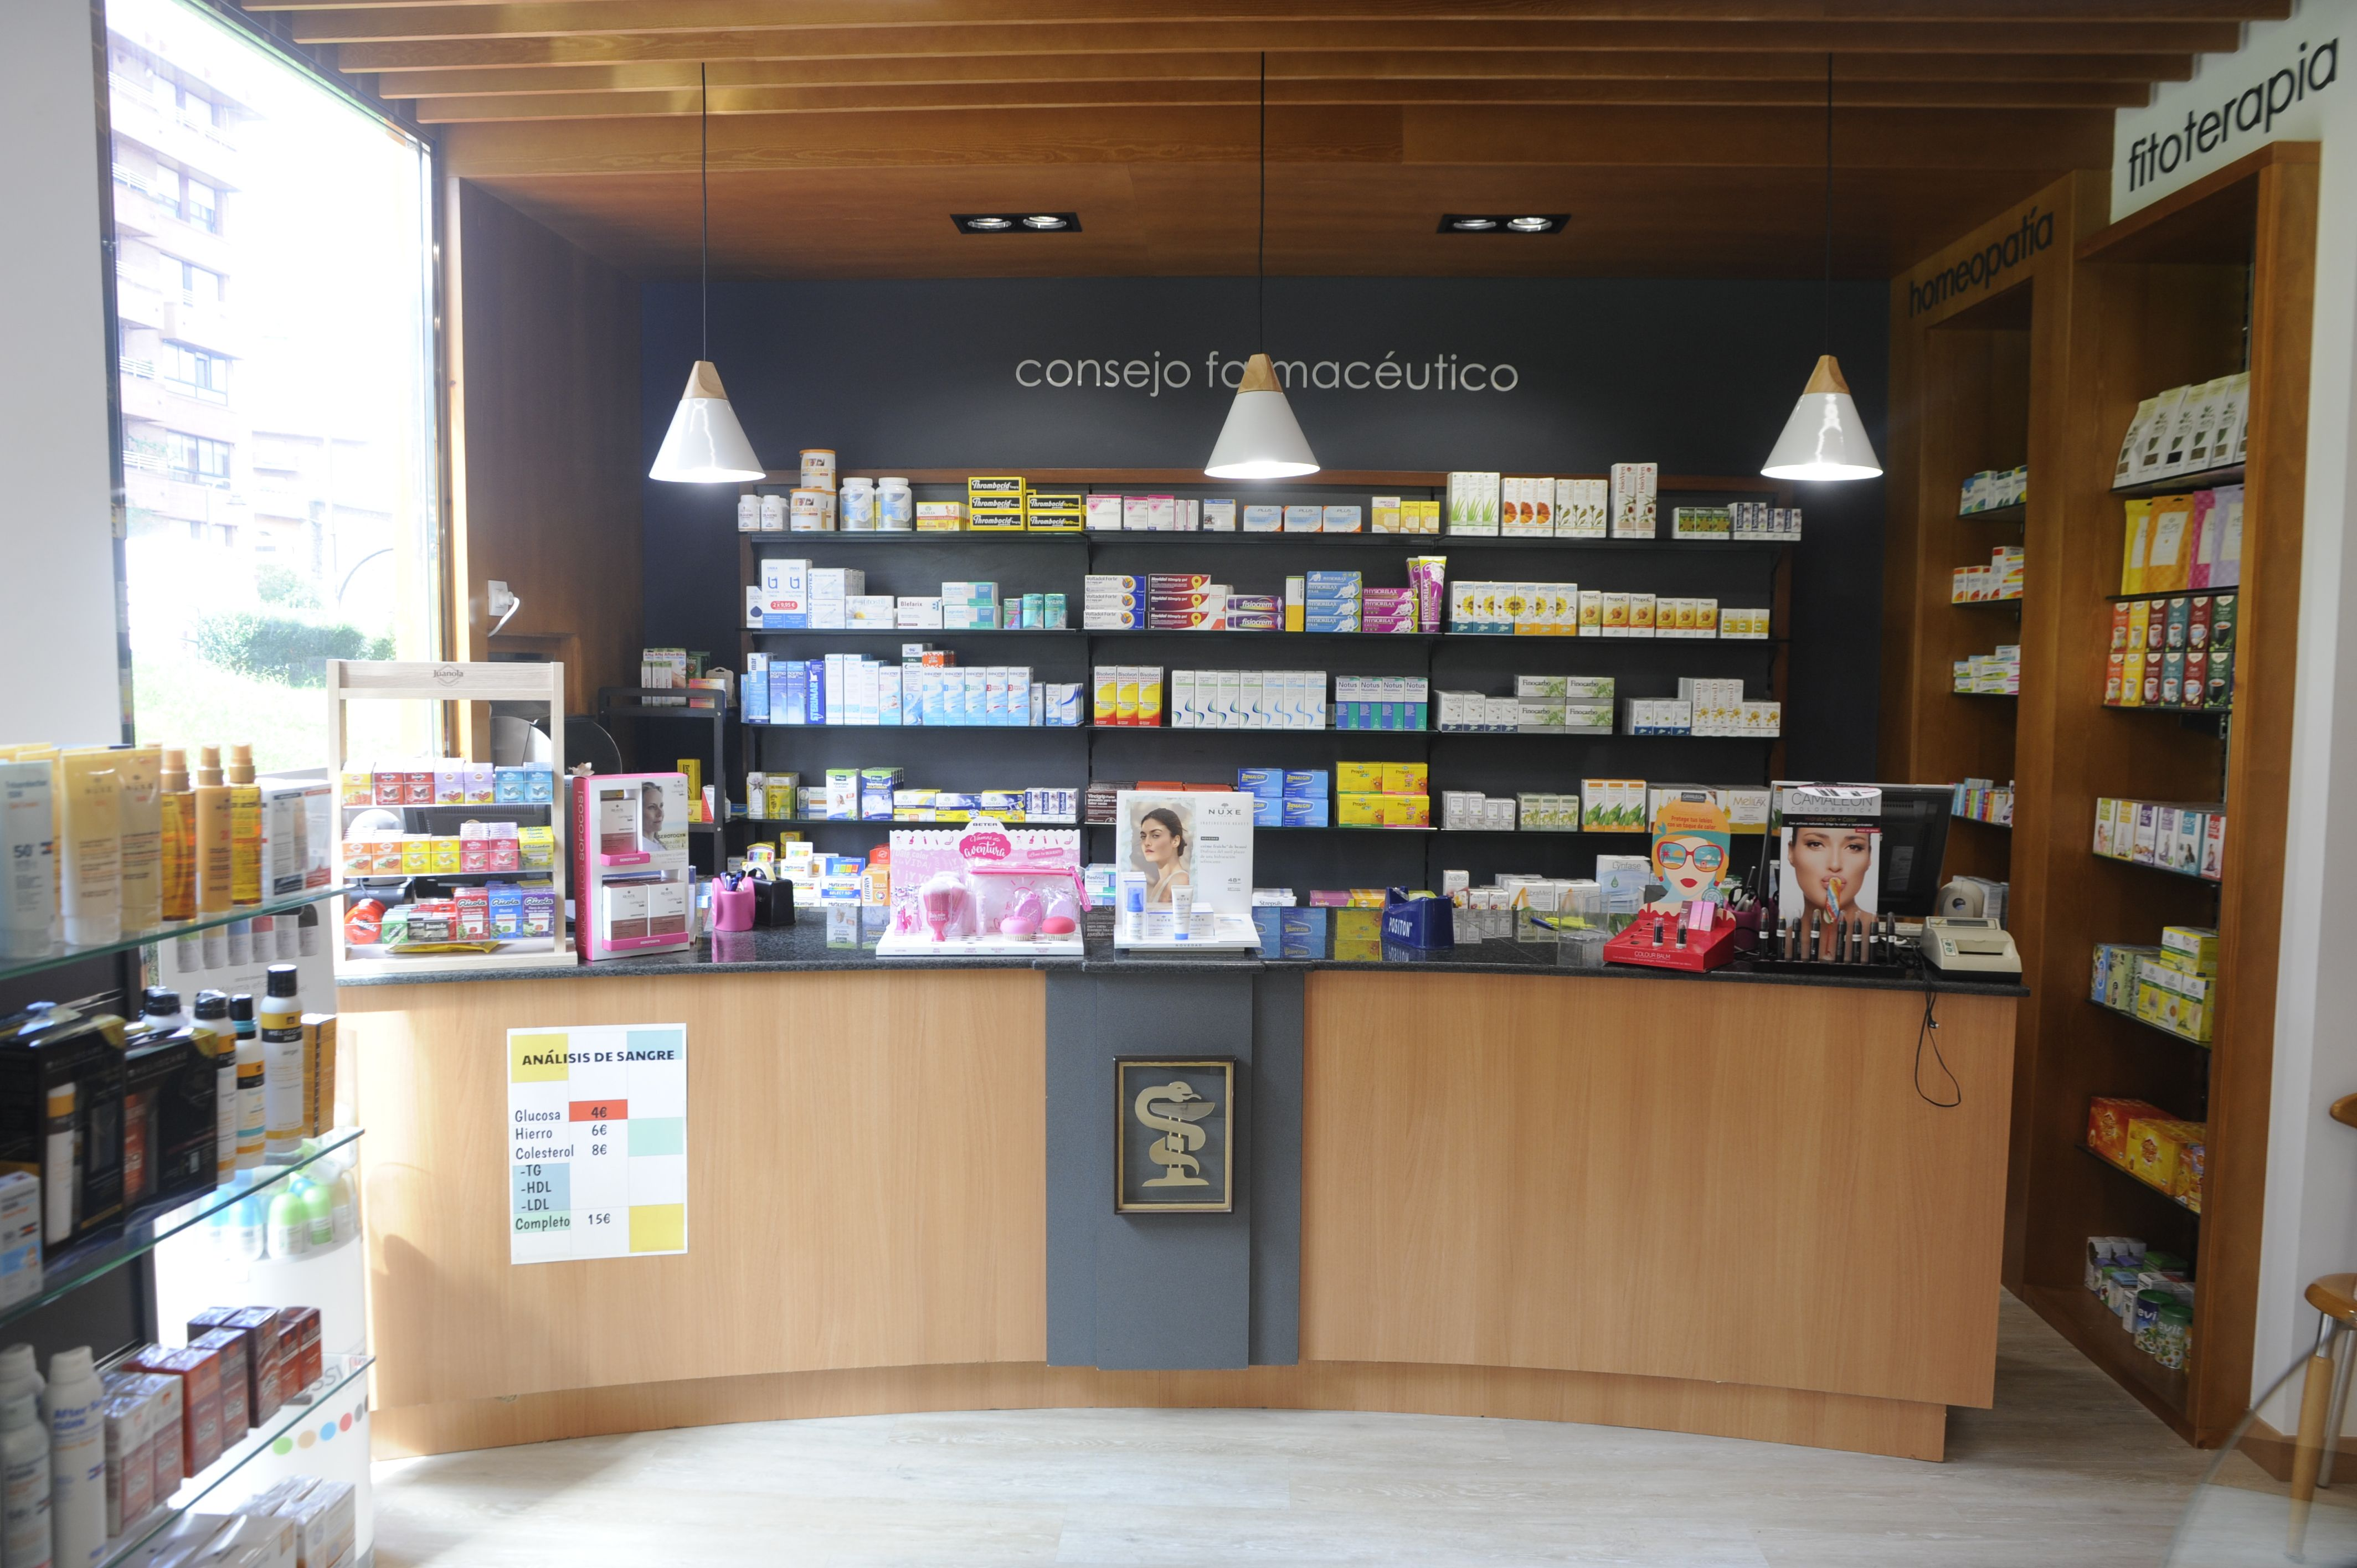 Foto 3 de Farmacia en Bilbao | Farmacia Socorro Rivas Castreje